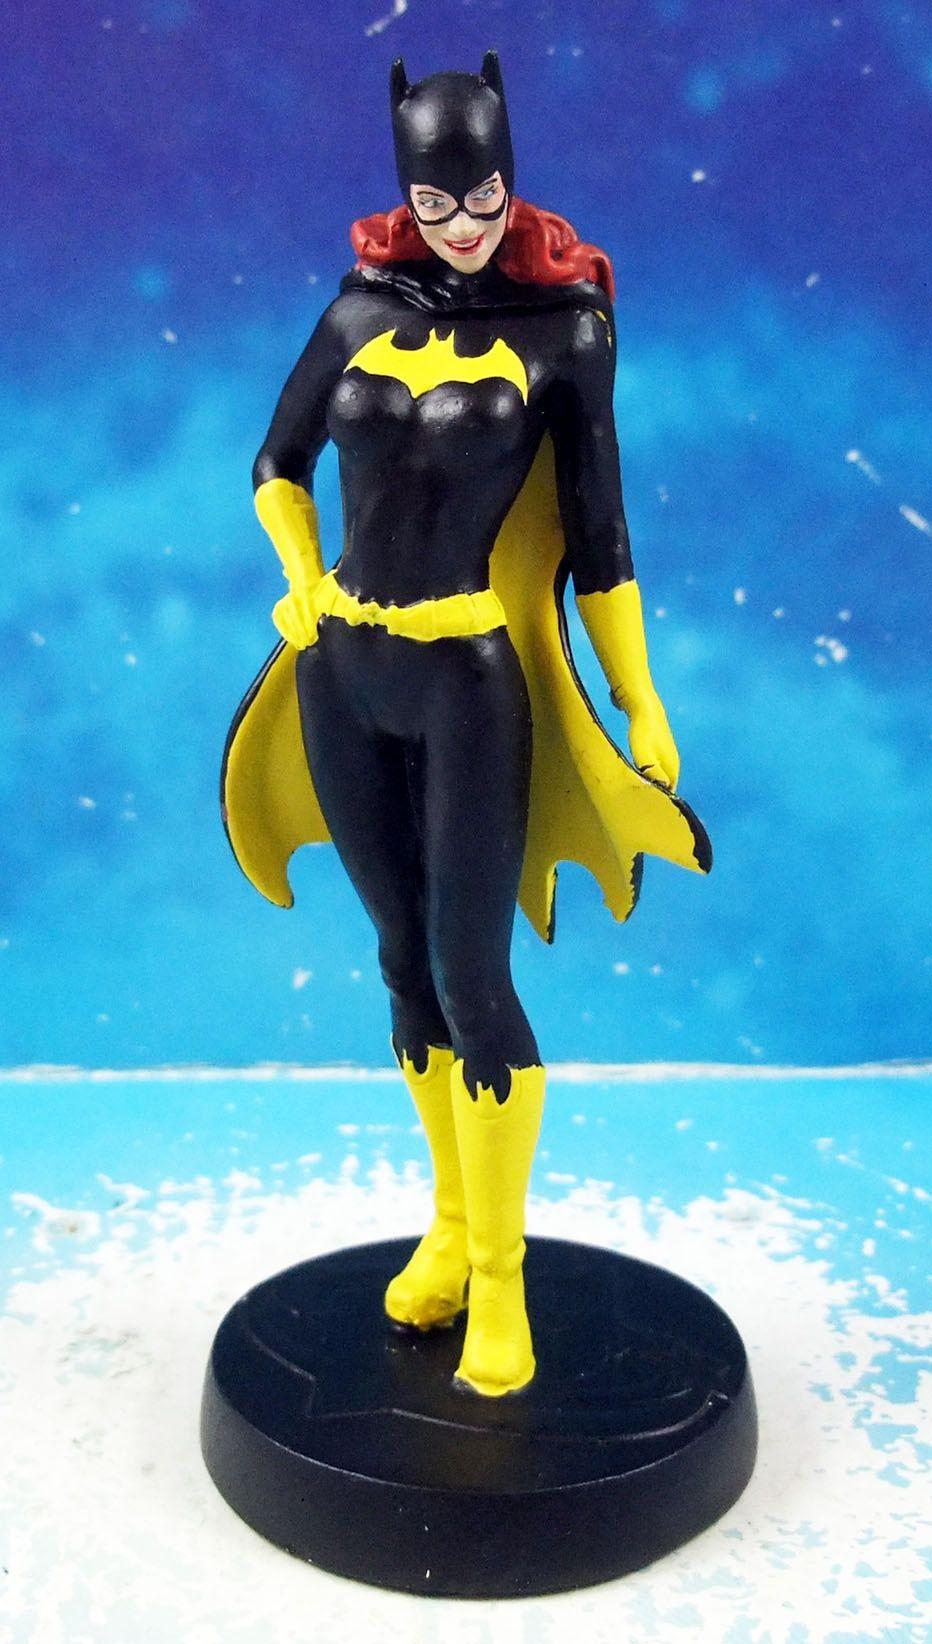 DC Super Heroes - Eaglemoss - #095 Batgirl (Barbara Gordon)